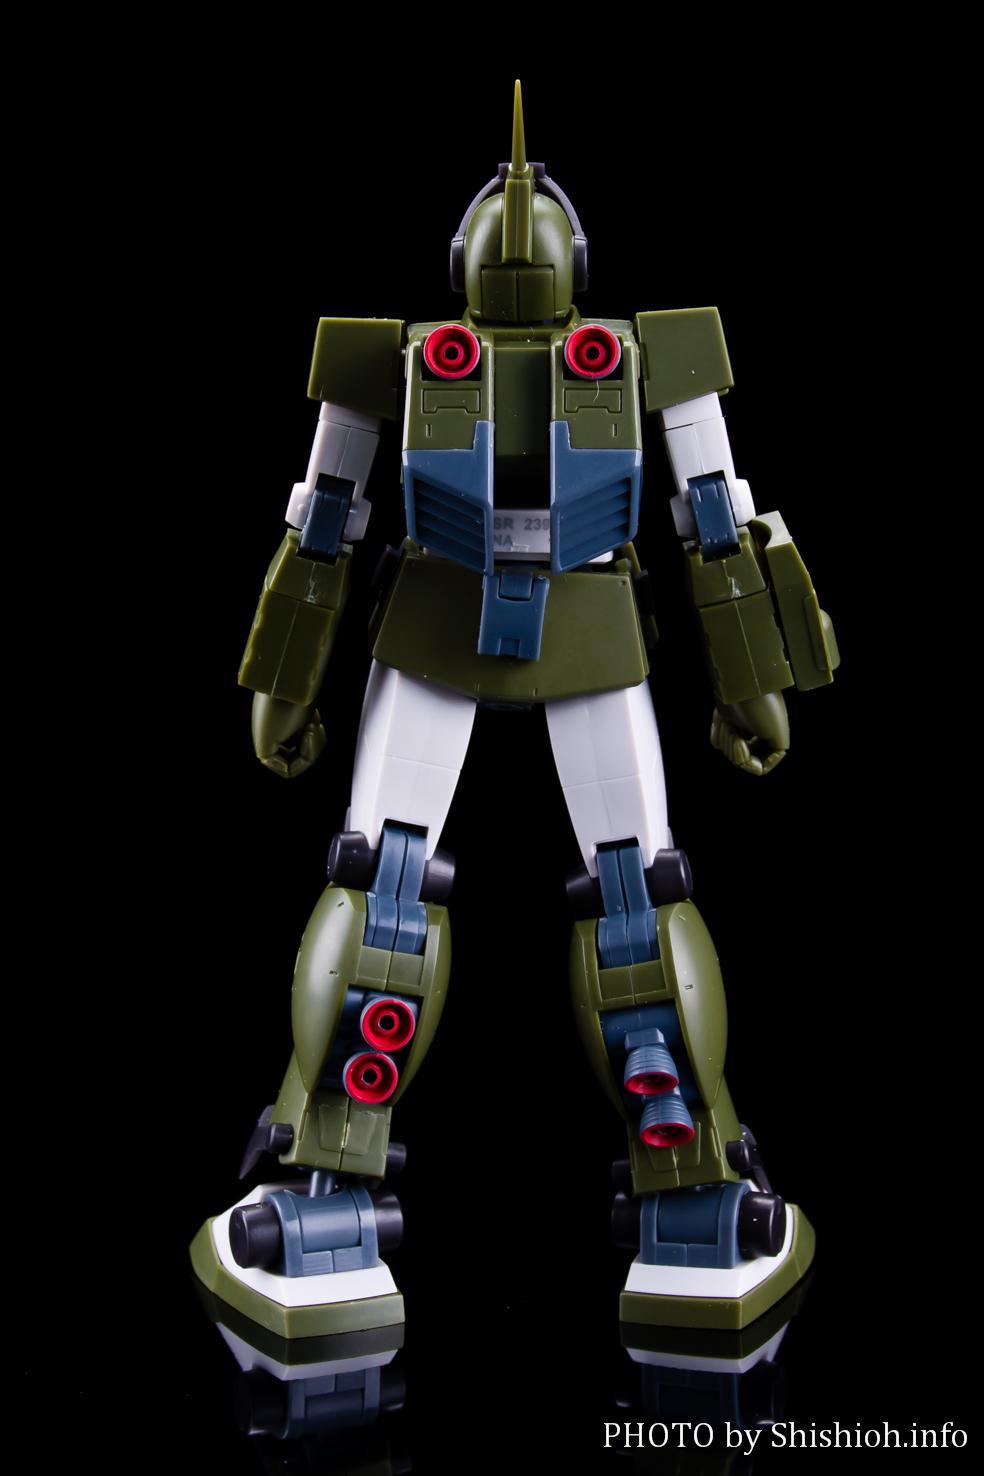 ROBOT魂〈SIDE MS〉RGM-79SC ジム・スナイパーカスタム ver. A.N.I.M.E.